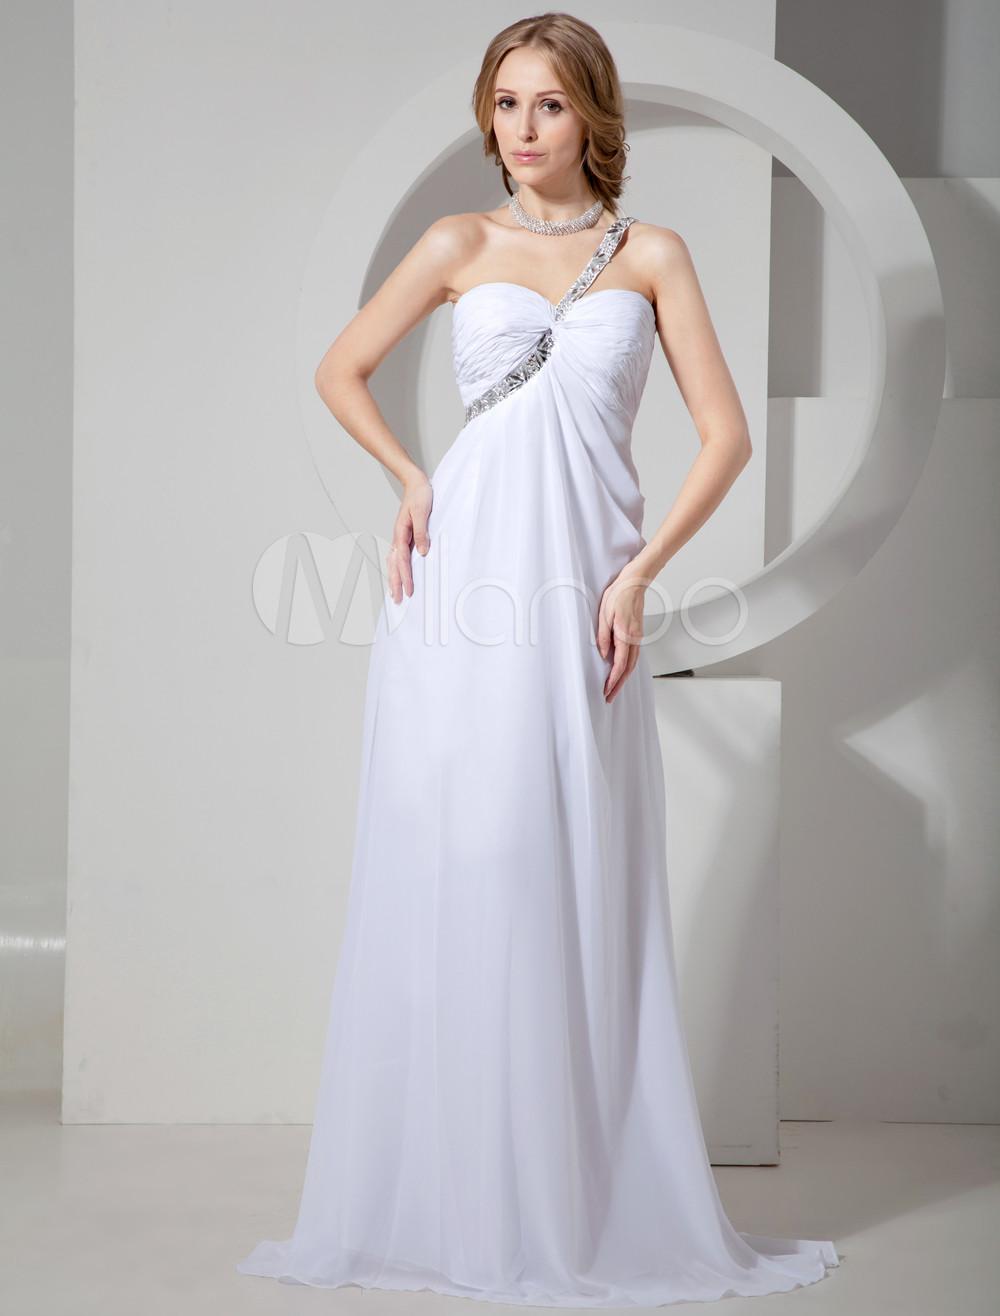 Modern White Chiffon Beading One Shoulder Prom Dress (Wedding Prom Dresses) photo